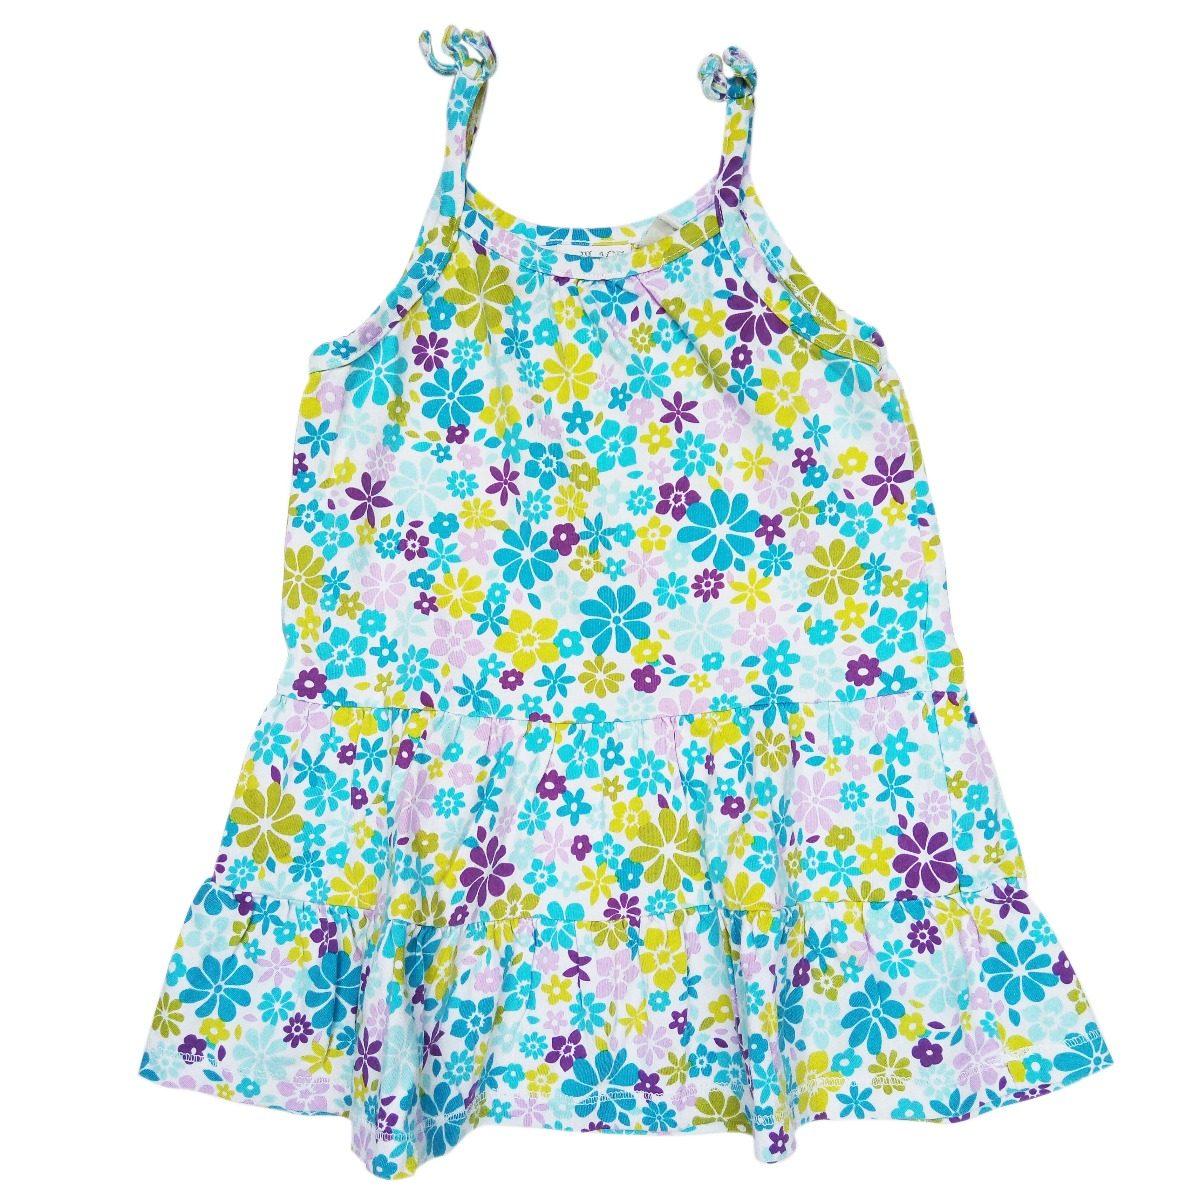 ed40c44e4 vestido de niña estampado en tela de algodón, talla 18 meses. Cargando zoom.